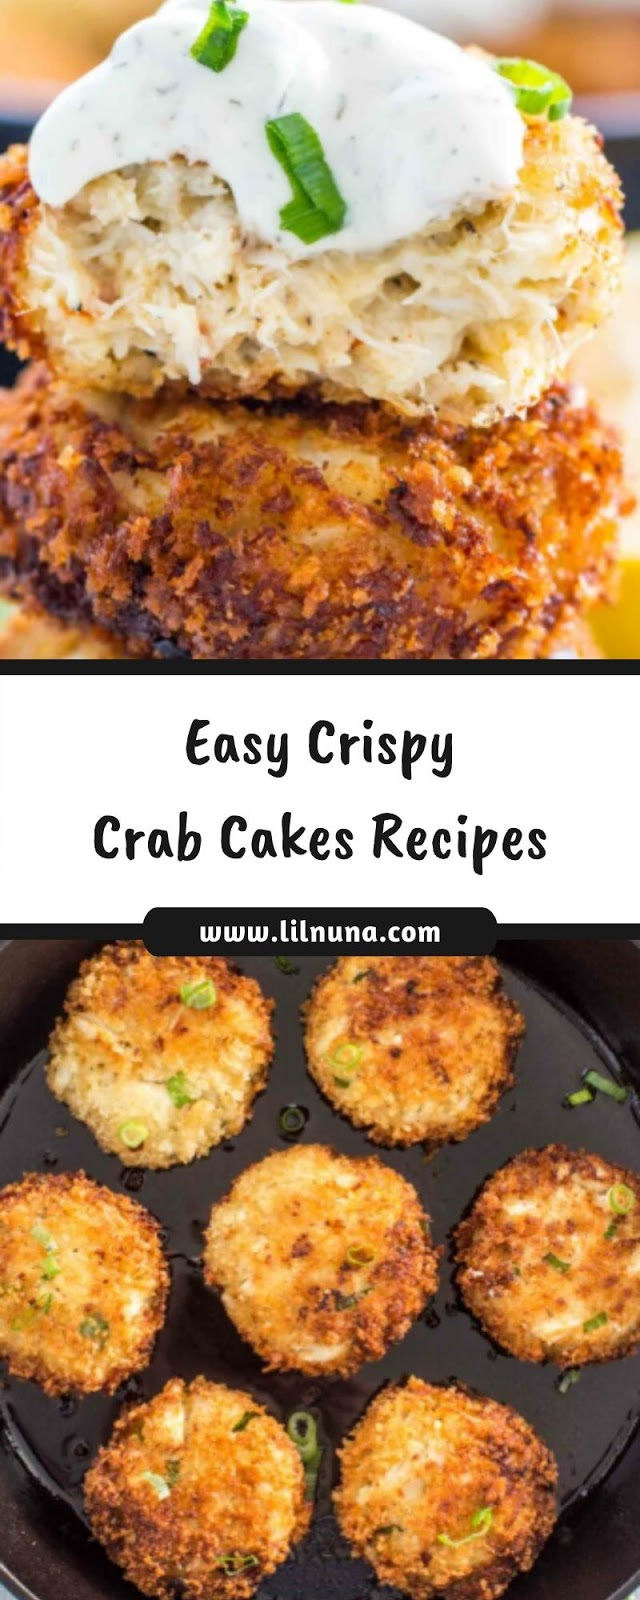 Easy Crispy Crab Cakes Recipes